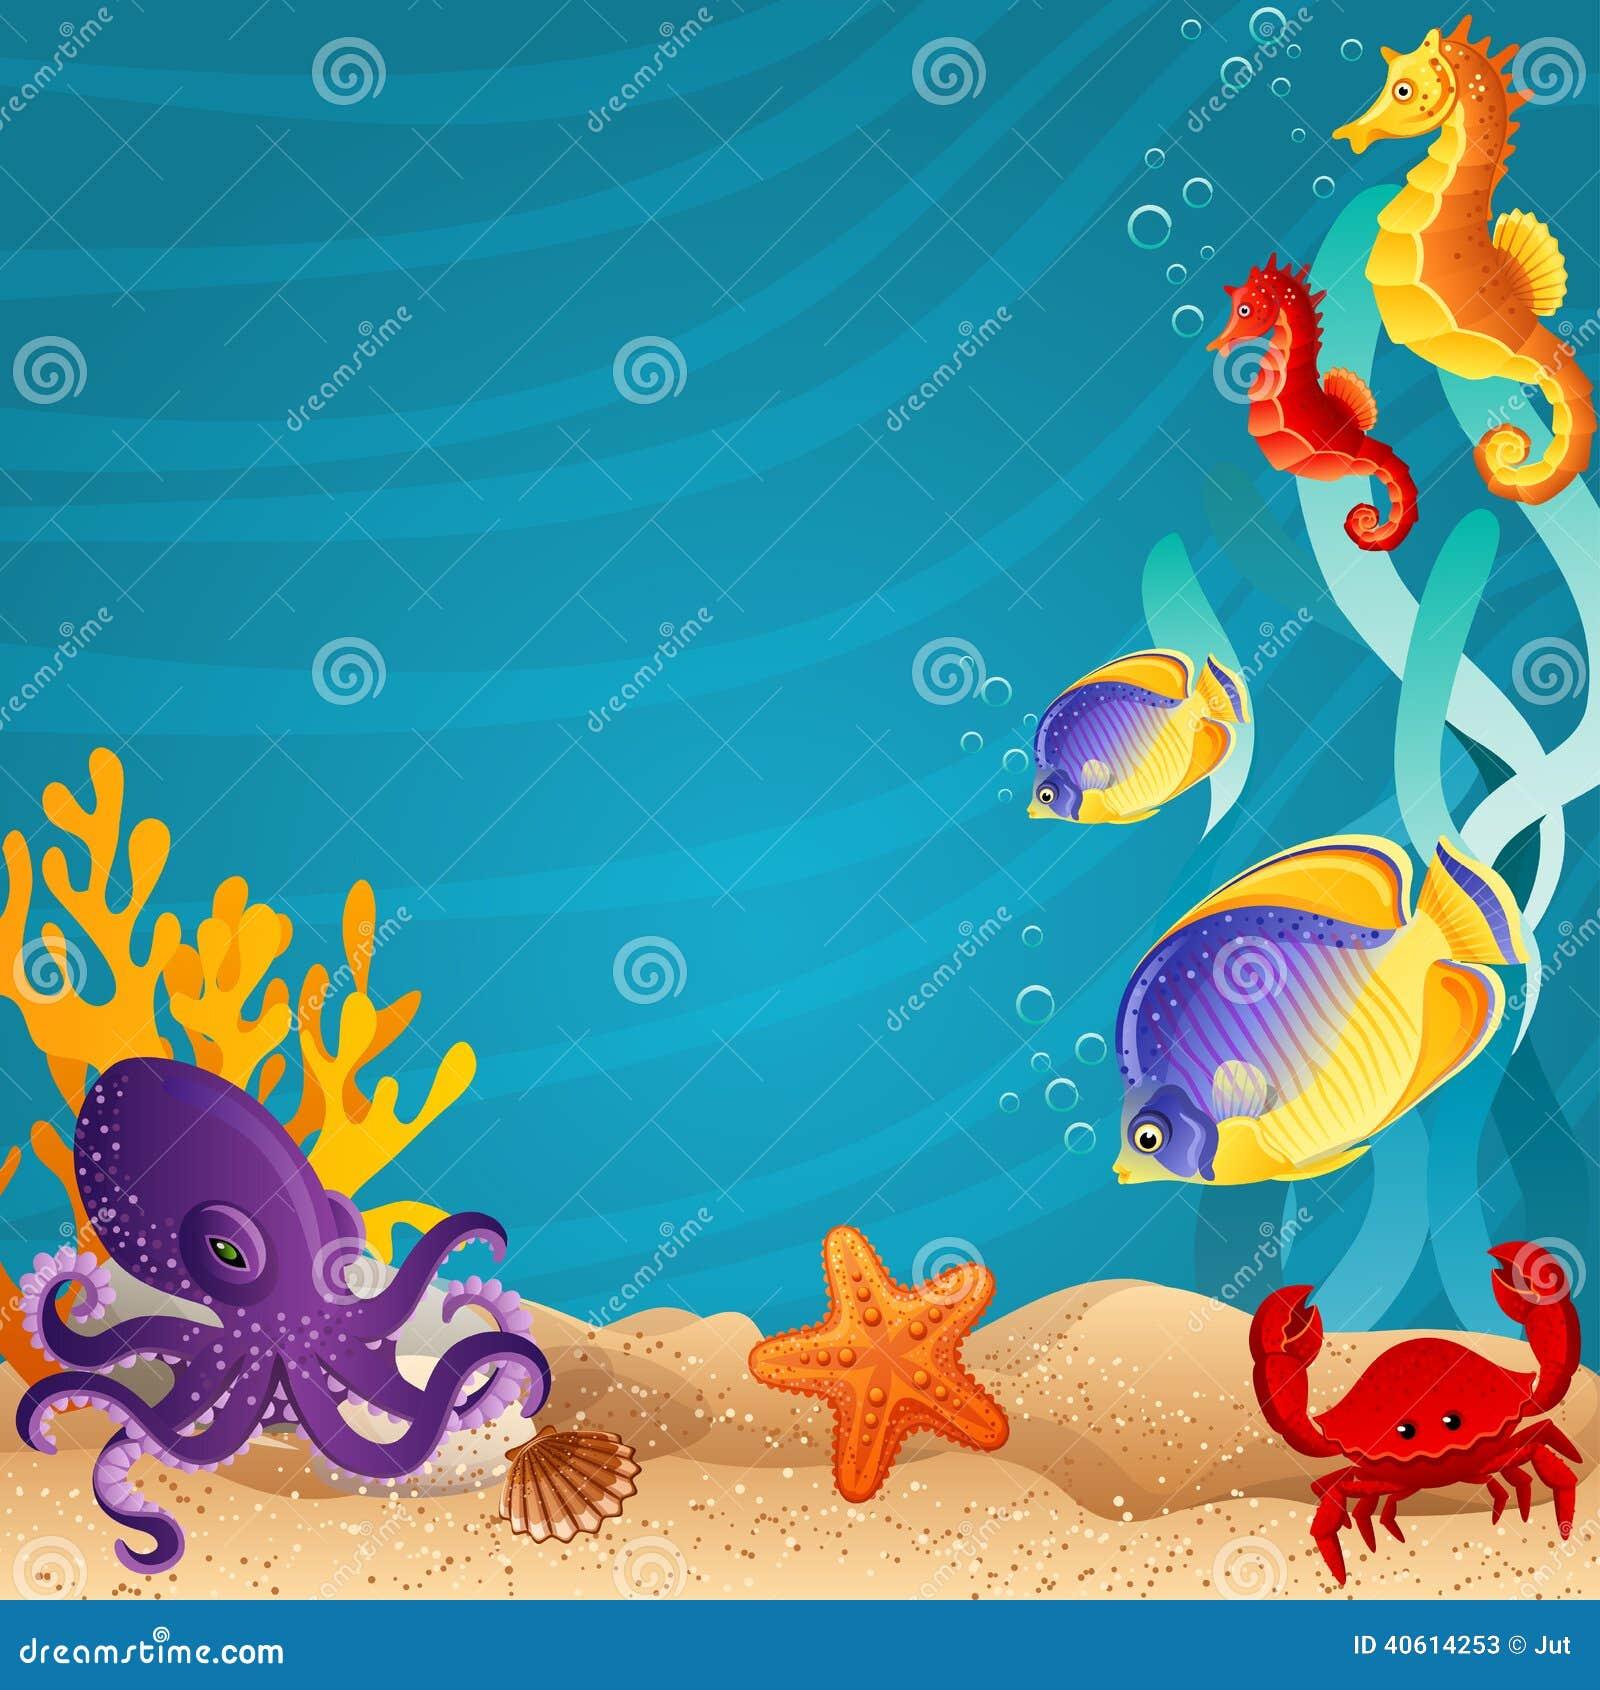 Fond Marin Illustration de Vecteur - Image: 40614253